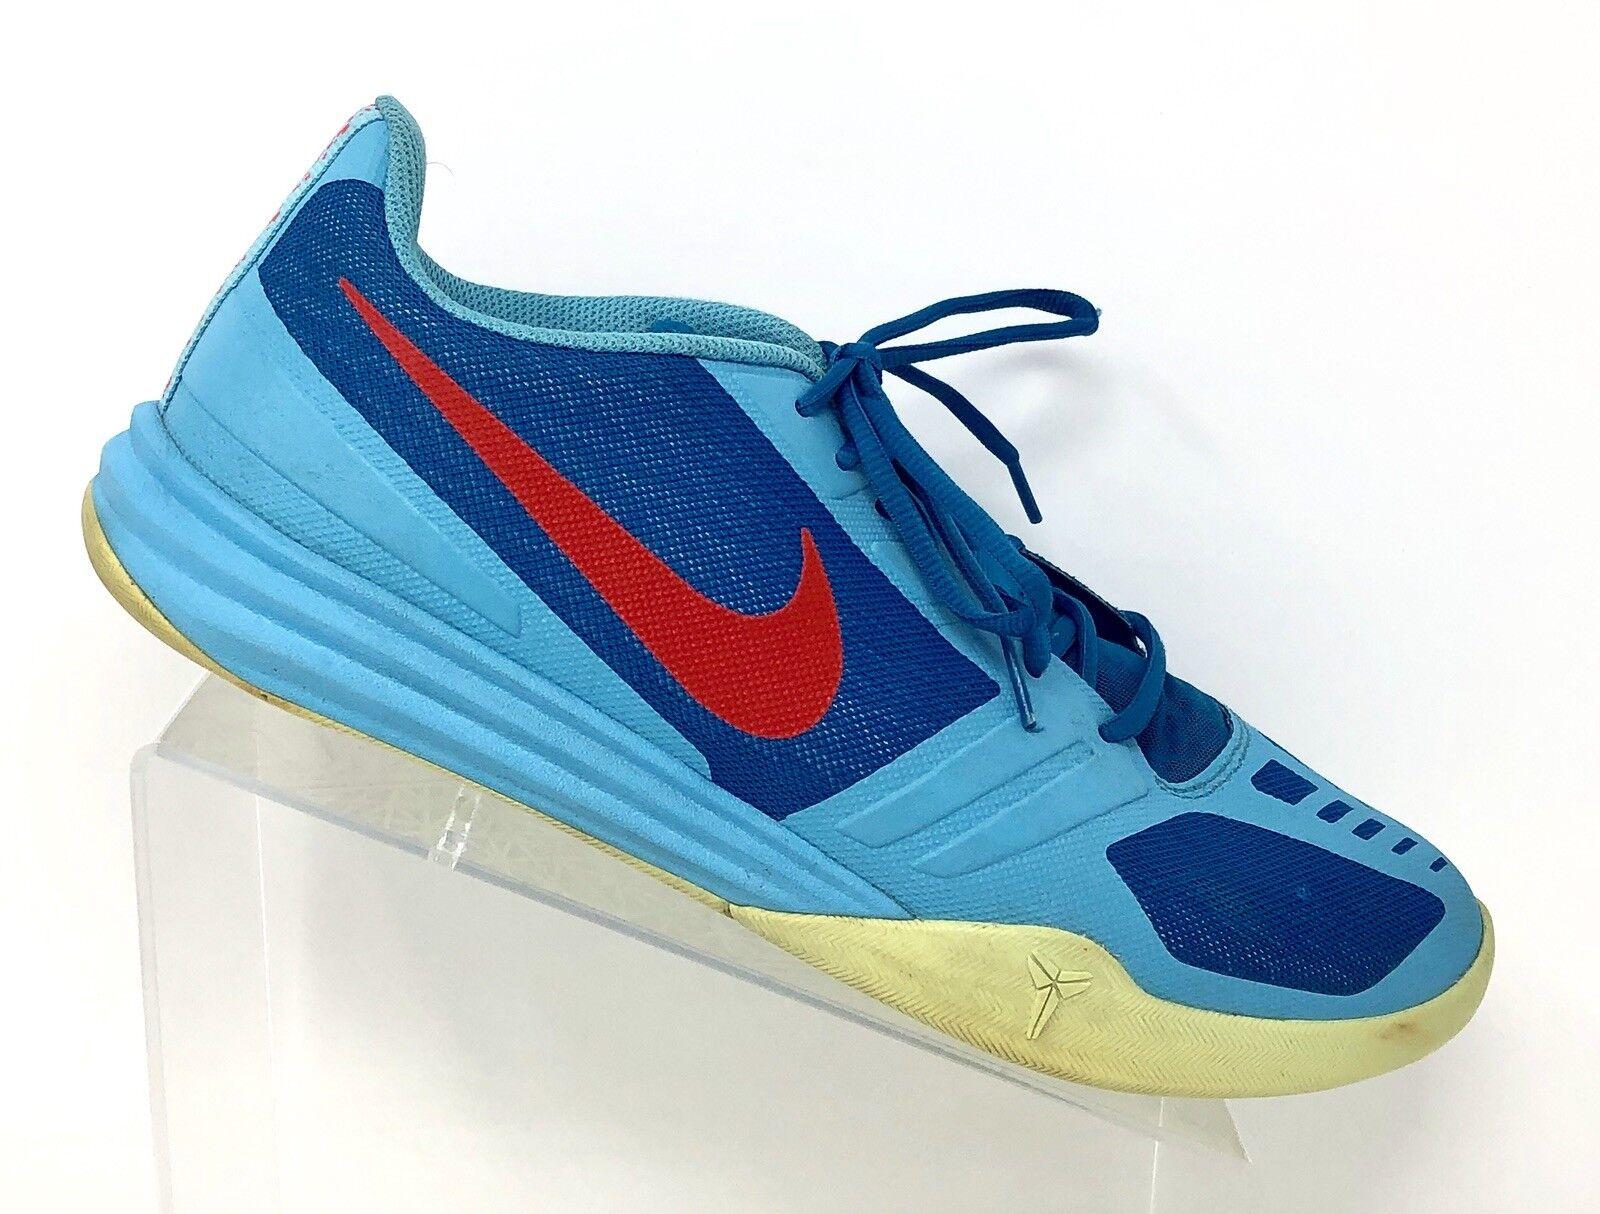 Nike Bleu Bleu Kobe Bryanhommetality Bleu Bleu Nike Basketball chaussures 3f5664